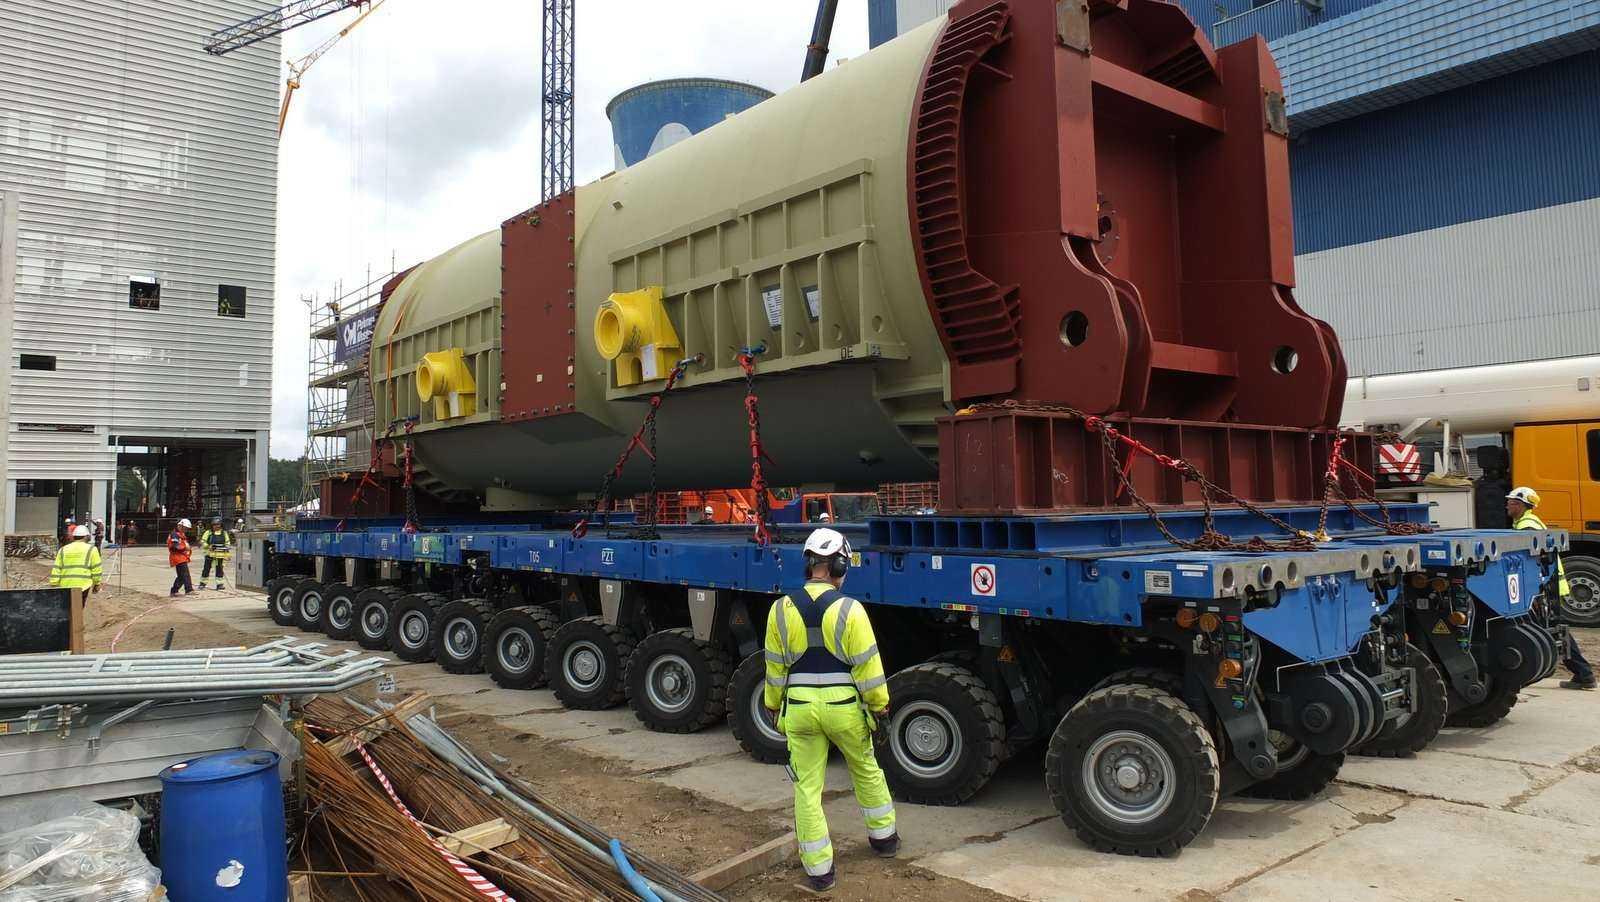 Transport generatora prądu do Elektrowni Opole